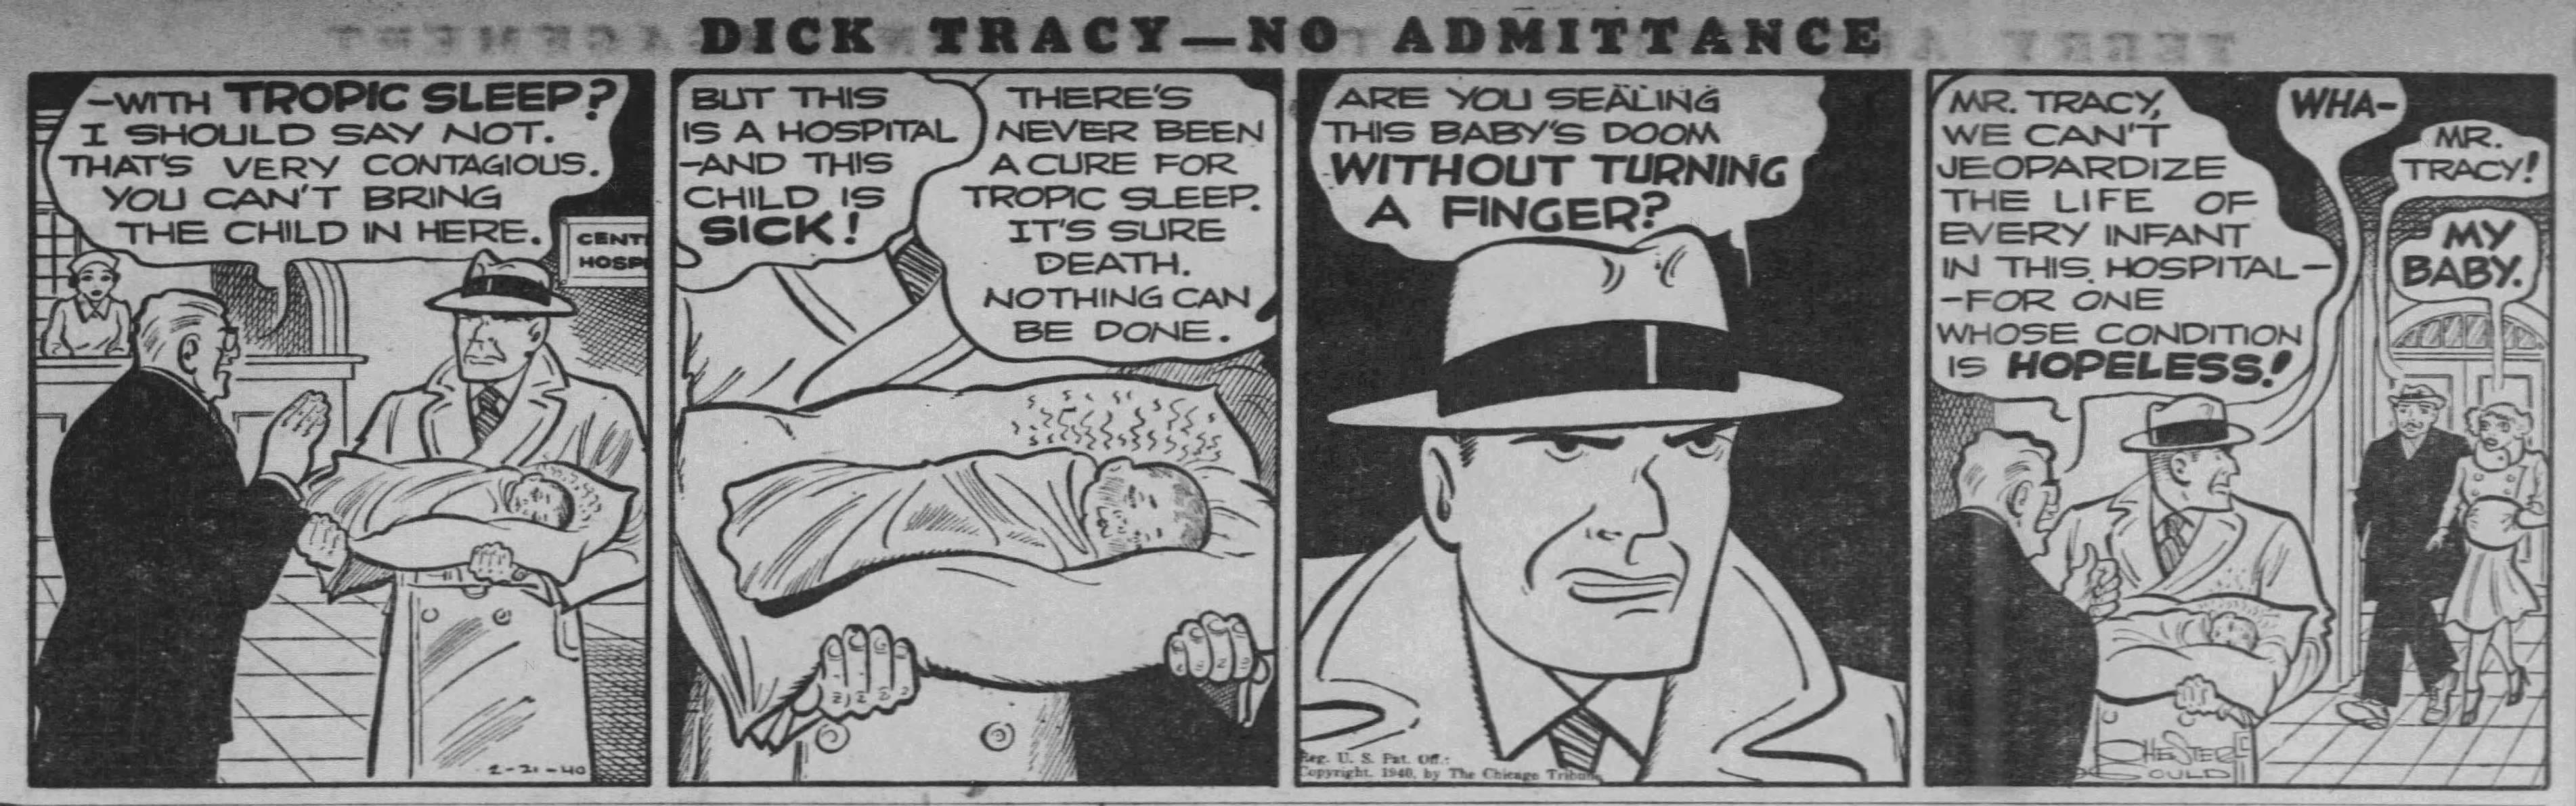 Daily_News_Wed__Feb_21__1940_(5).jpg